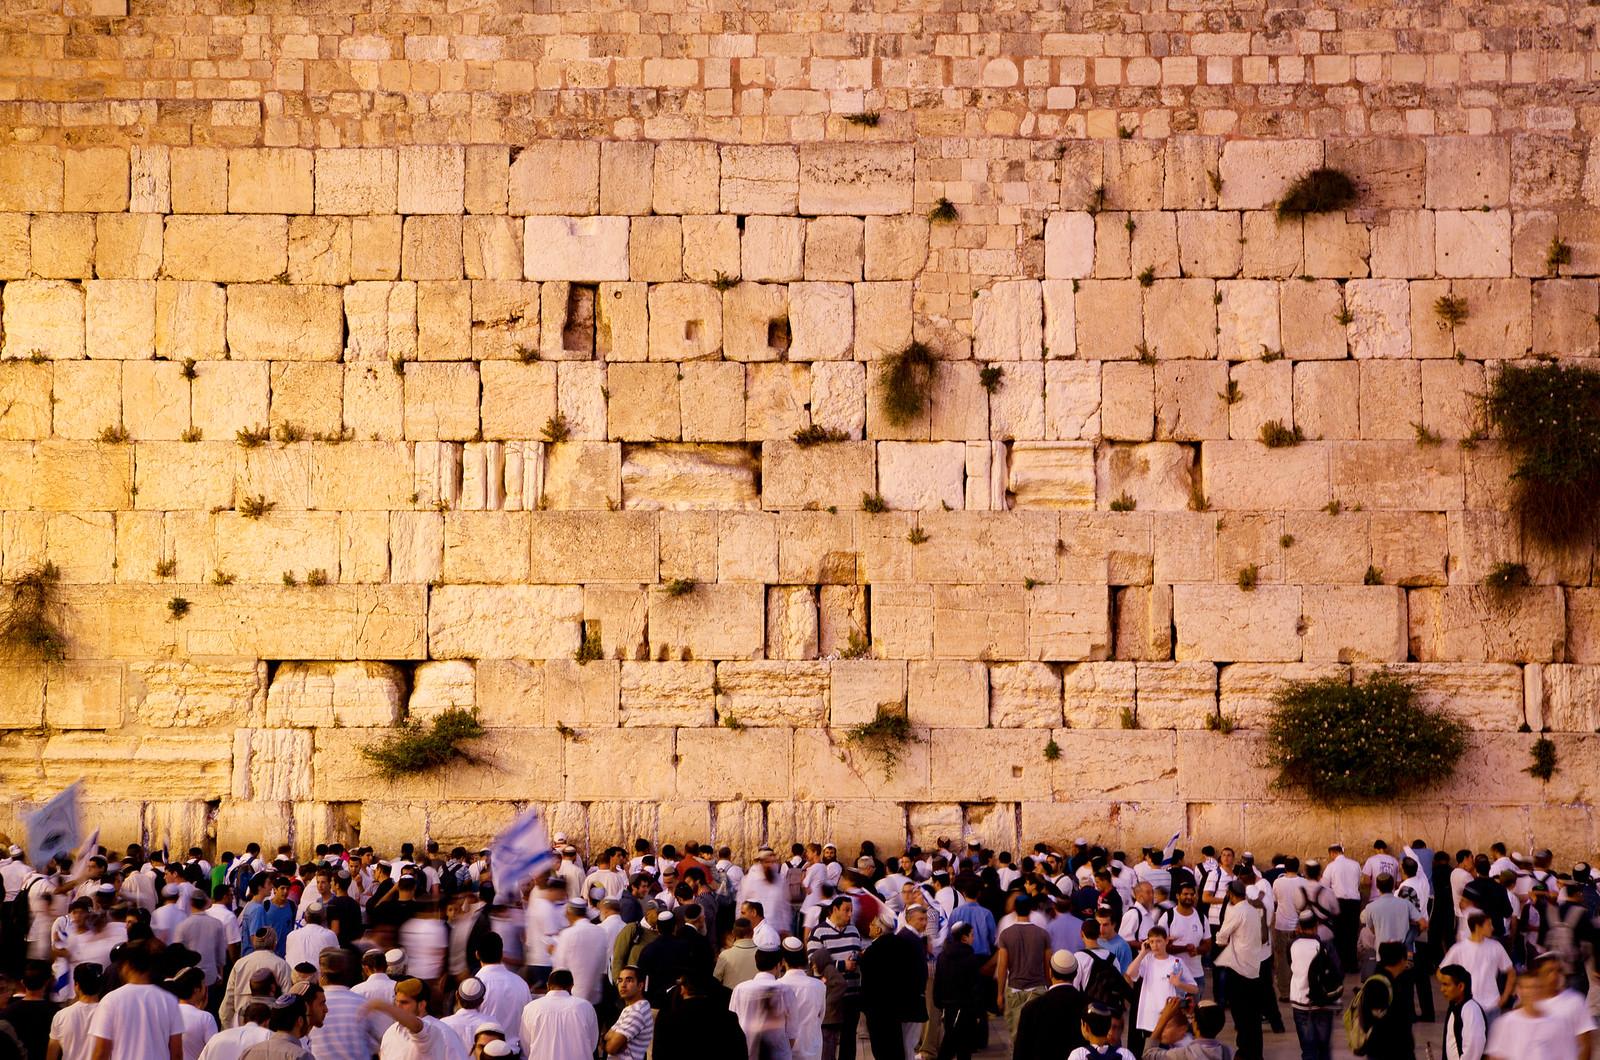 Jerusalem_Western Wall_2_Noam Chen_IMOT